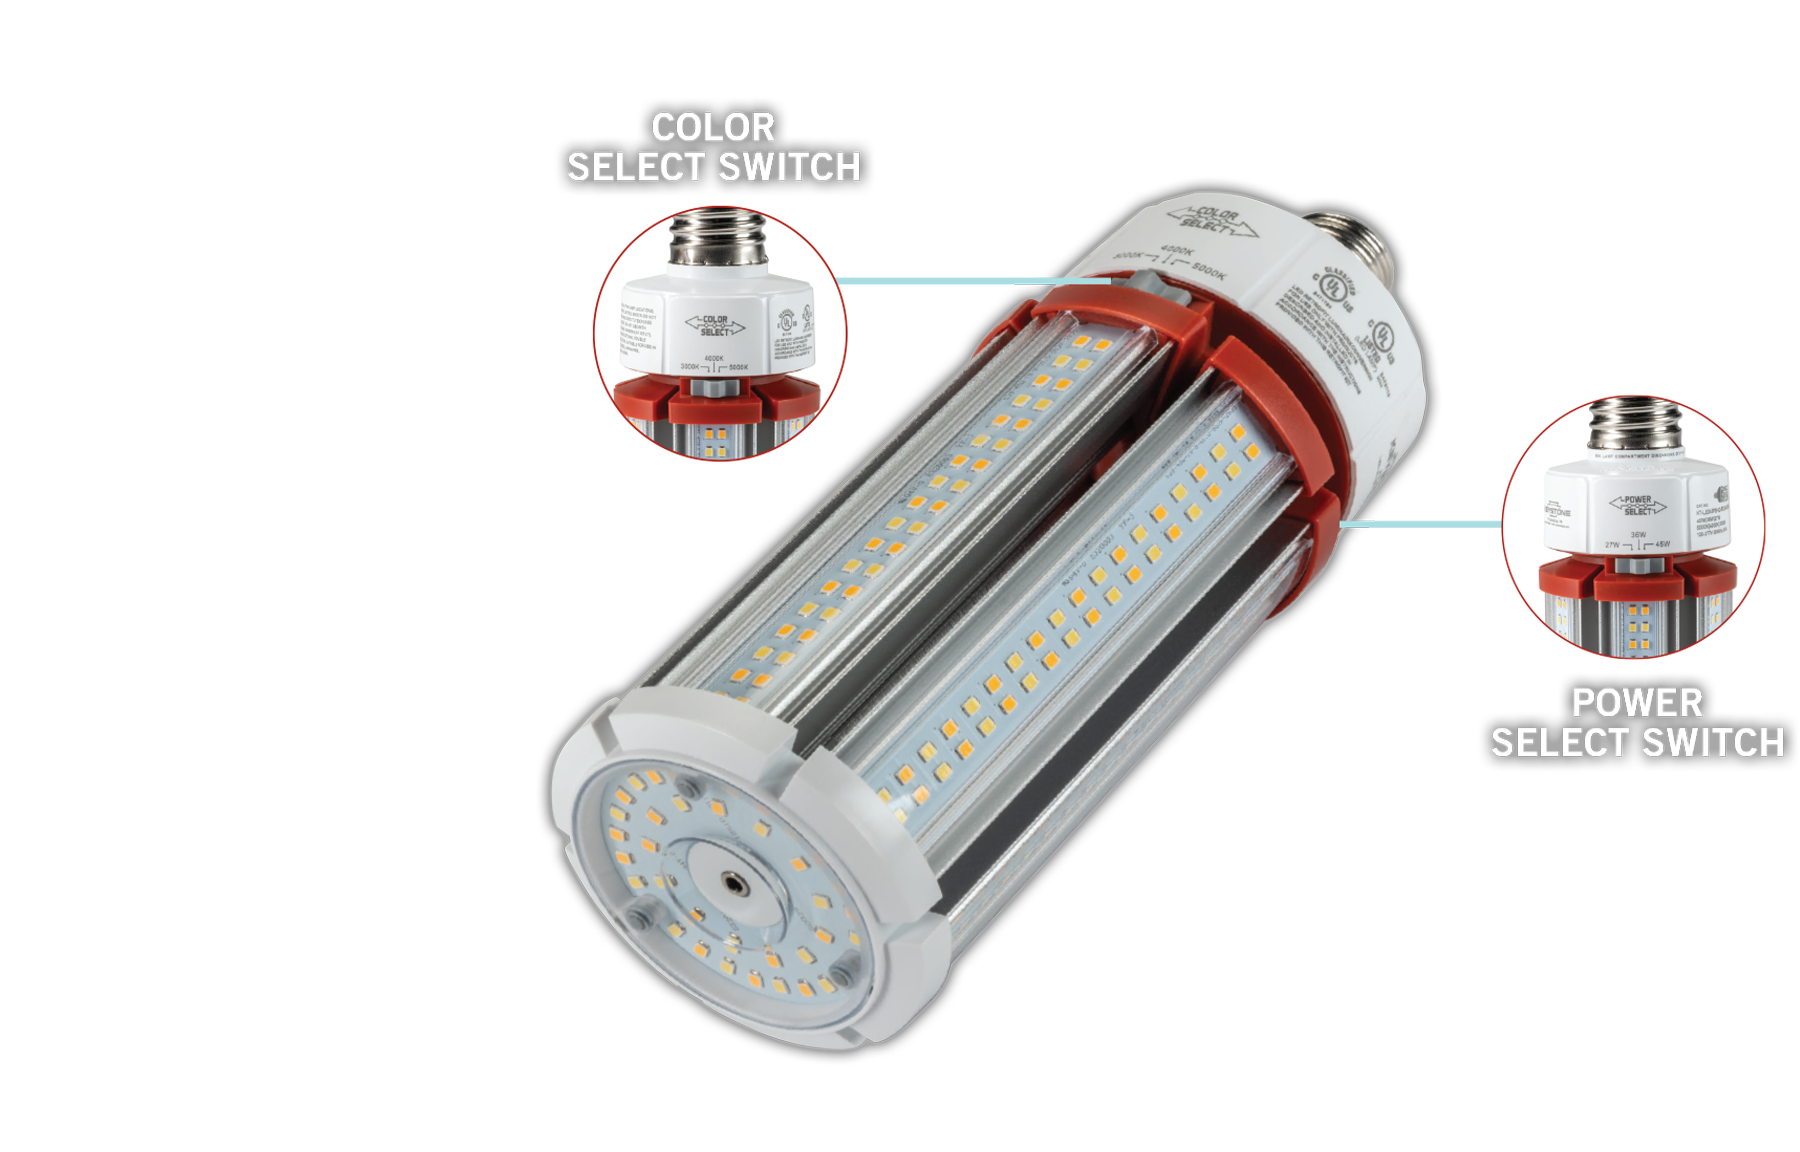 Power & Color Select HID LED lamp reduces skus